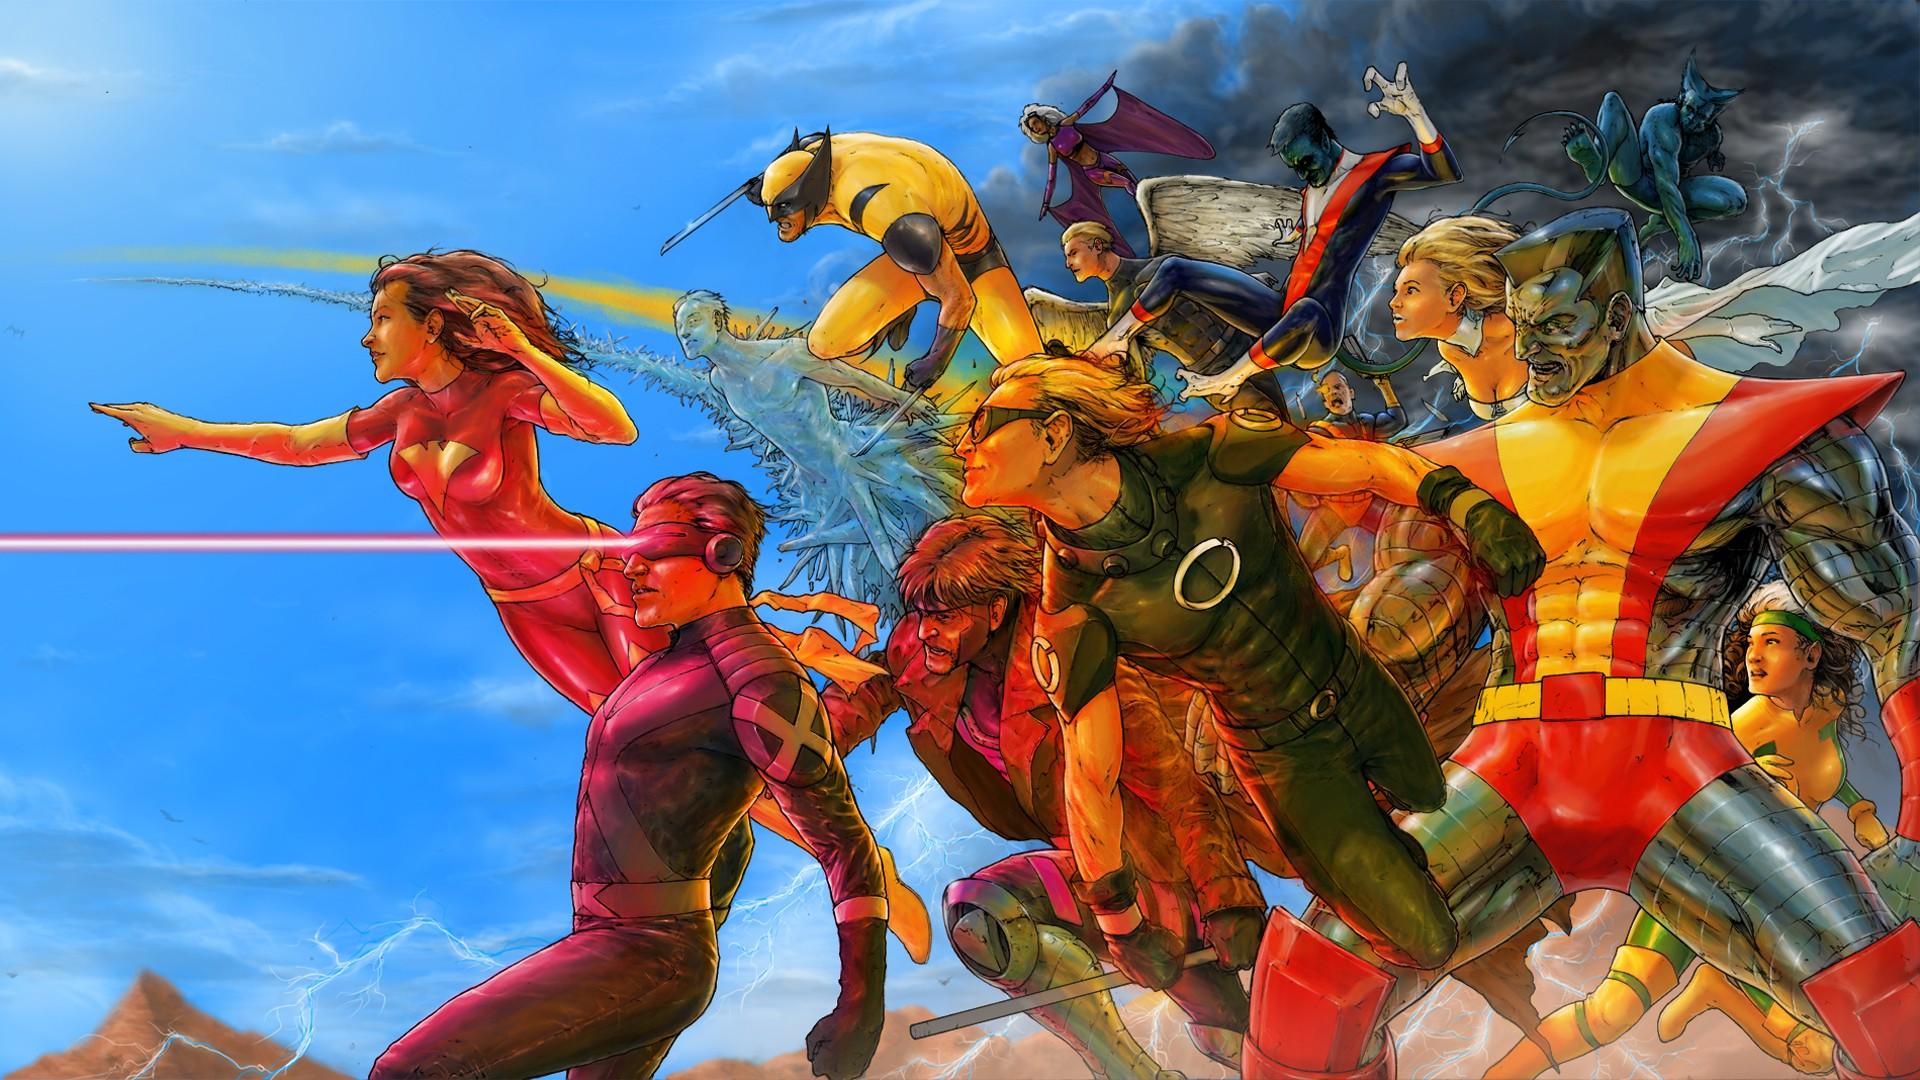 Must see Wallpaper Marvel Archangel - Wolverine-hero-X-Men-comics-Cable-Rogue-archangel-mythology-Jean-Grey-Cyclops-Gambit-Iceman-White-Queen-colossus-Nightcrawler-Quicksilver-Beast-Henry-McCoy-Storm-character-screenshot-30630  Graphic_93861.jpg